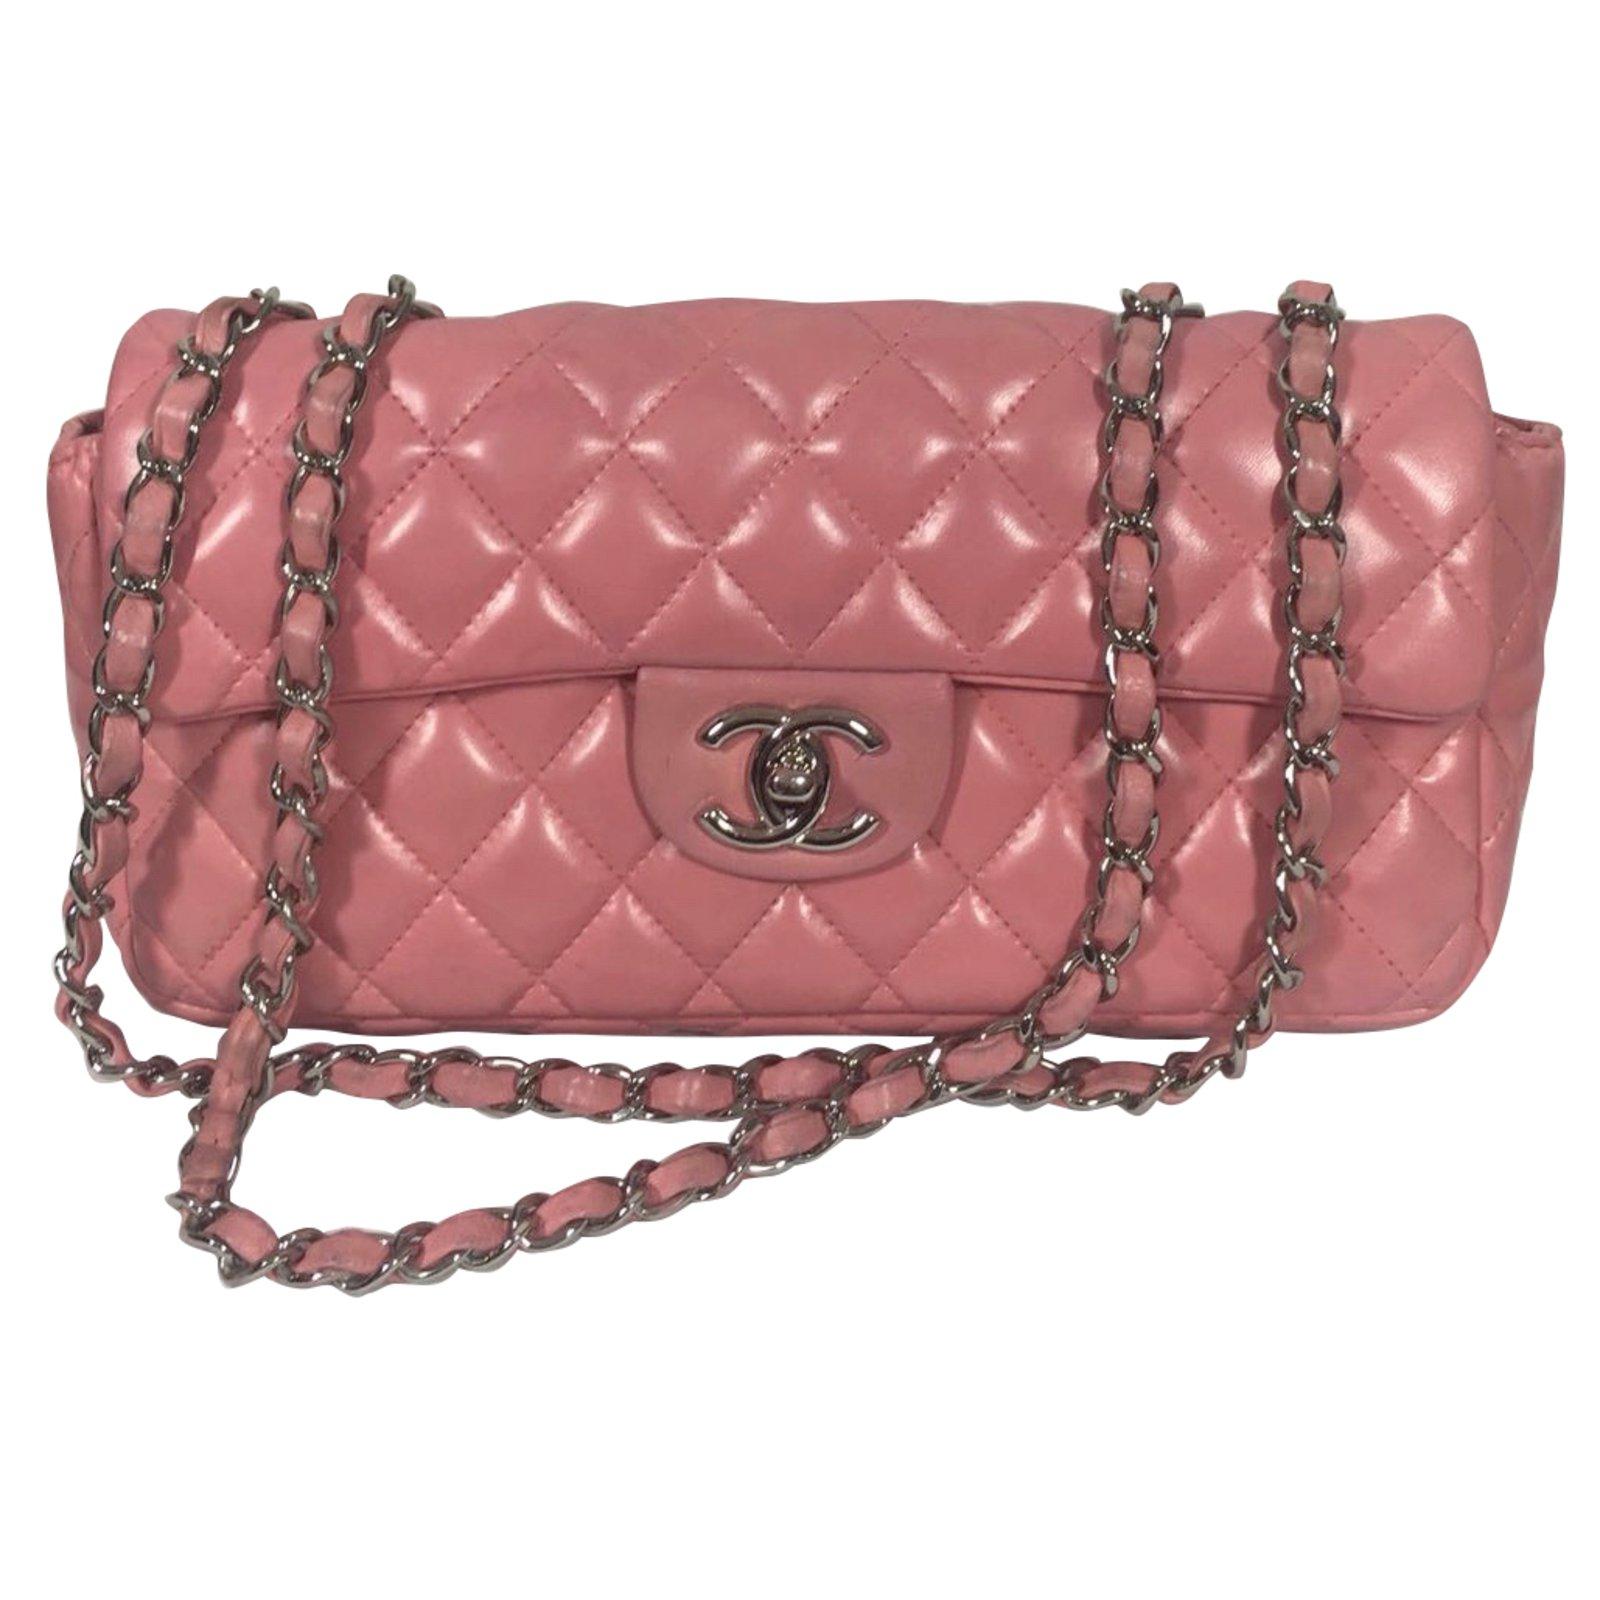 7584181456b4 Chanel Handbags Pink - Foto Handbag All Collections Salonagafiya.Com